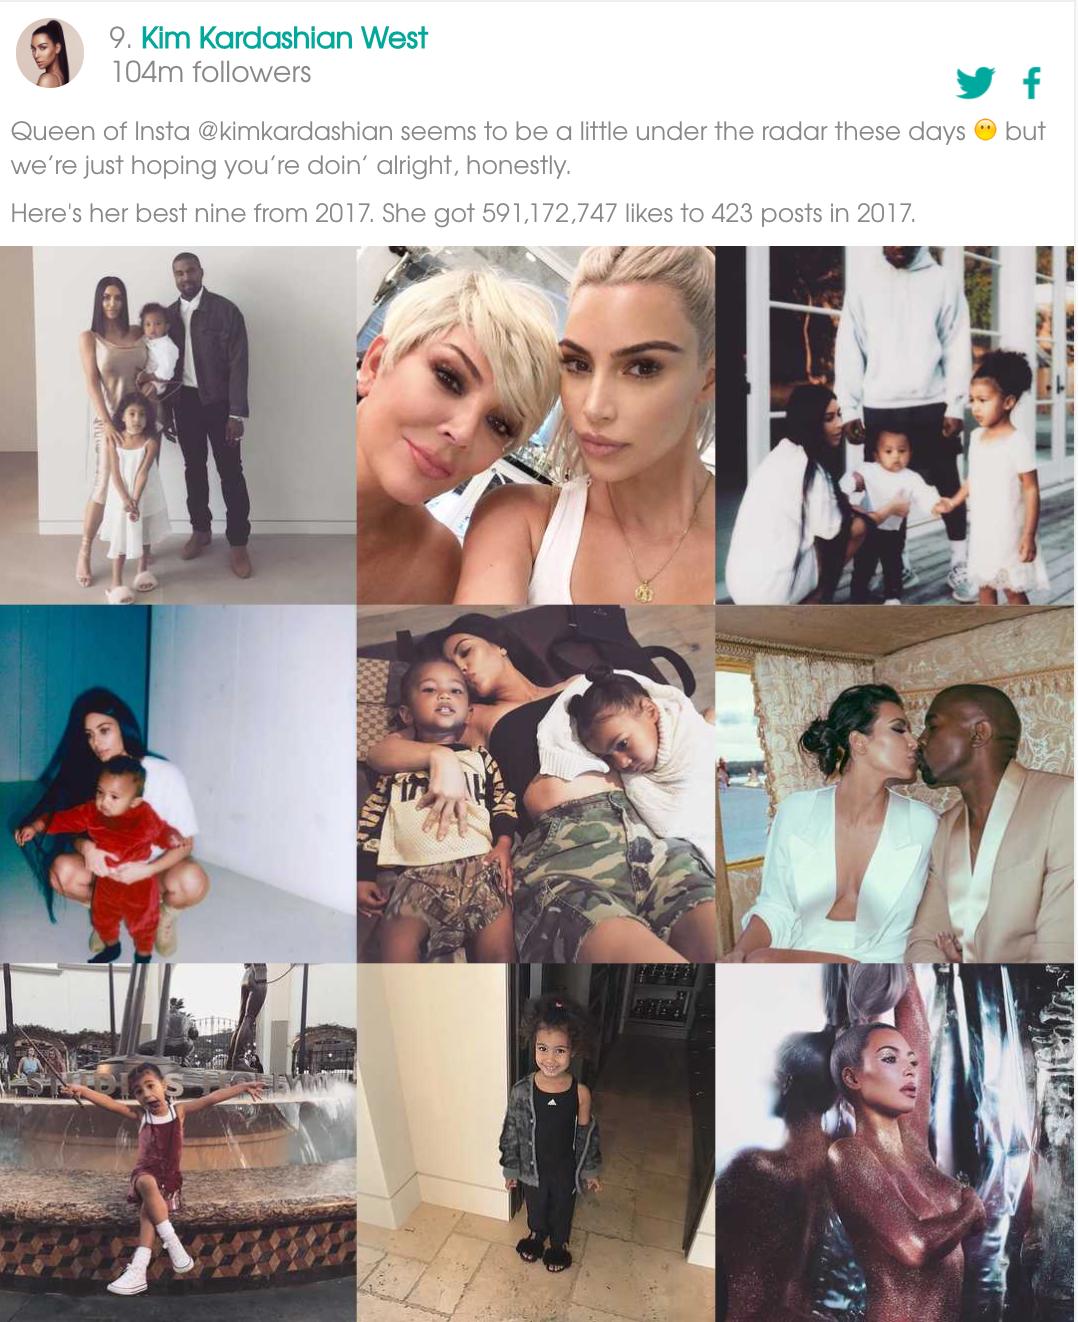 Instagram 2017年度最佳热门图片TOP 9 !-iQiQi